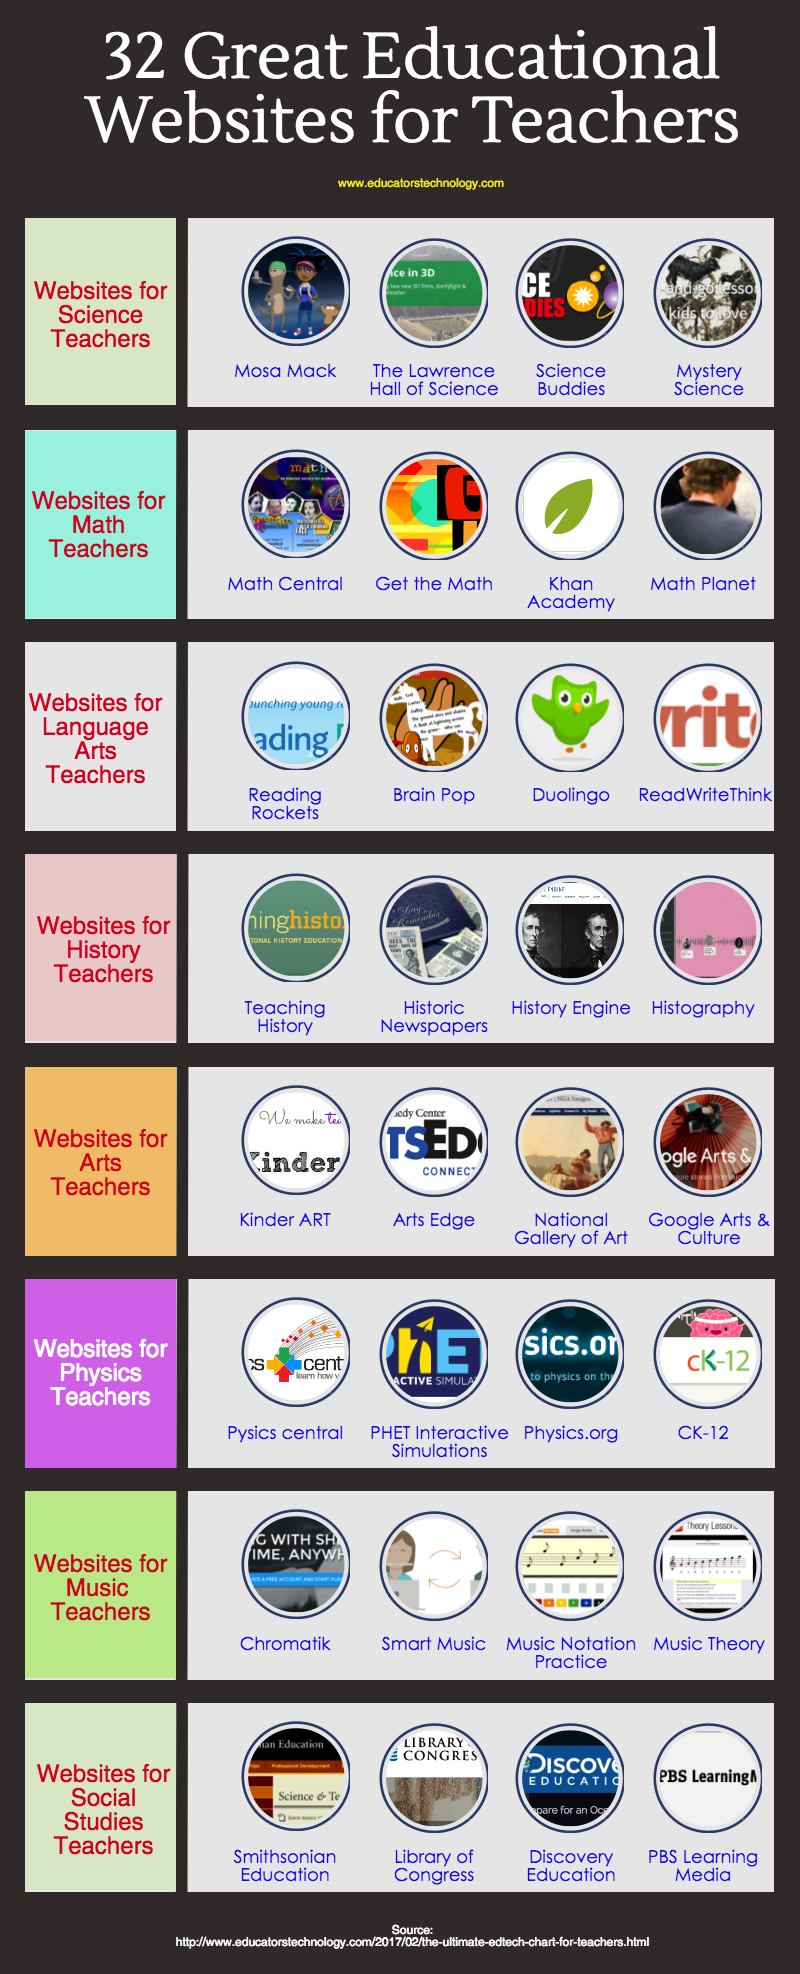 https://www.educatorstechnology.com/2018/05/some-of-best-edtech-websites-for.html